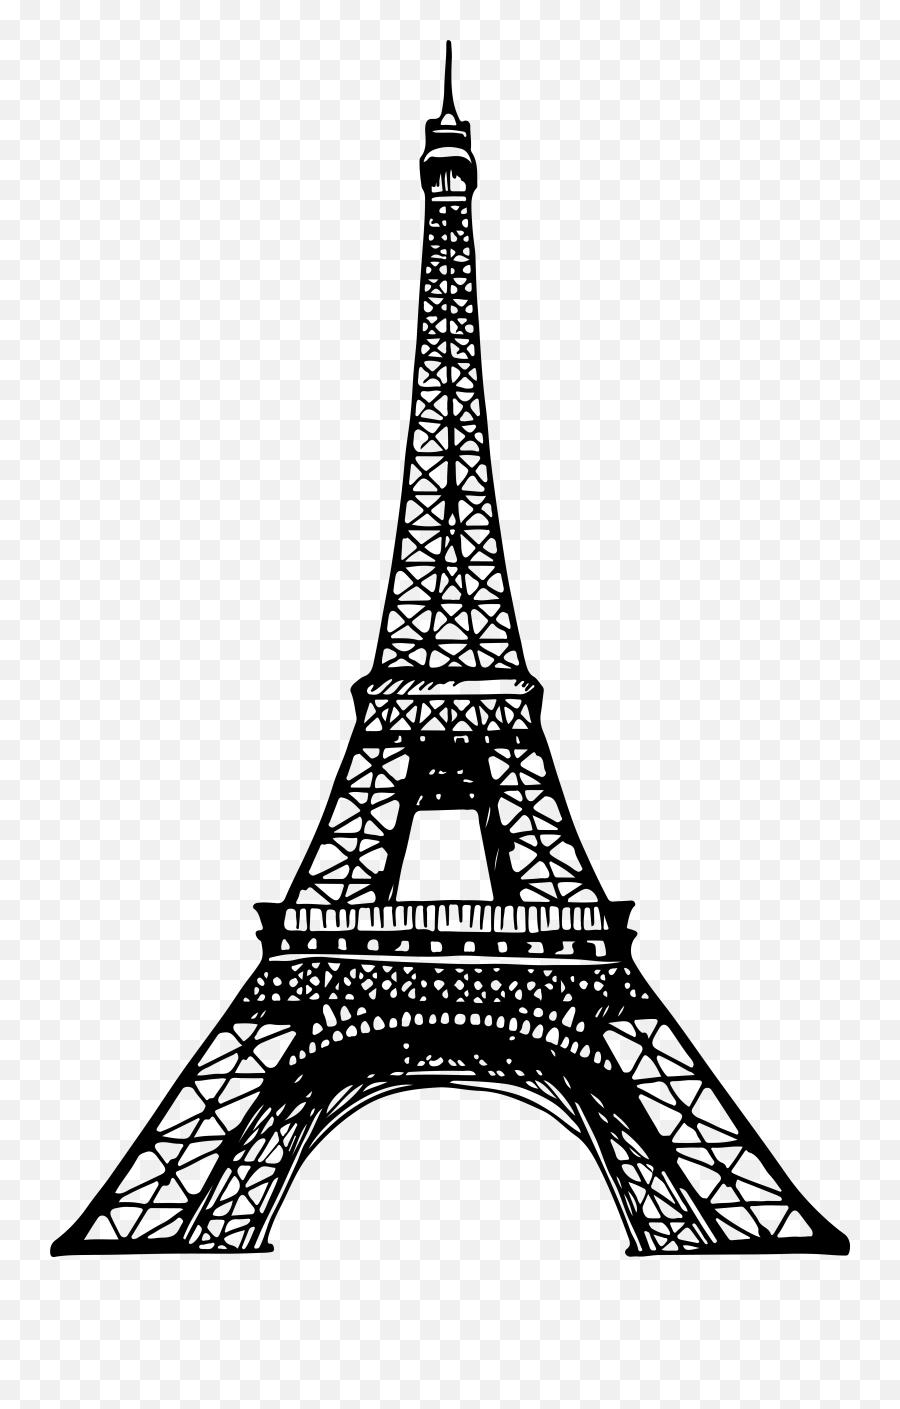 Eiffel Tower Clipart Silhouette - Clip Art Transparent Background Eiffel Tower Emoji,Eiffel Tower Emoji